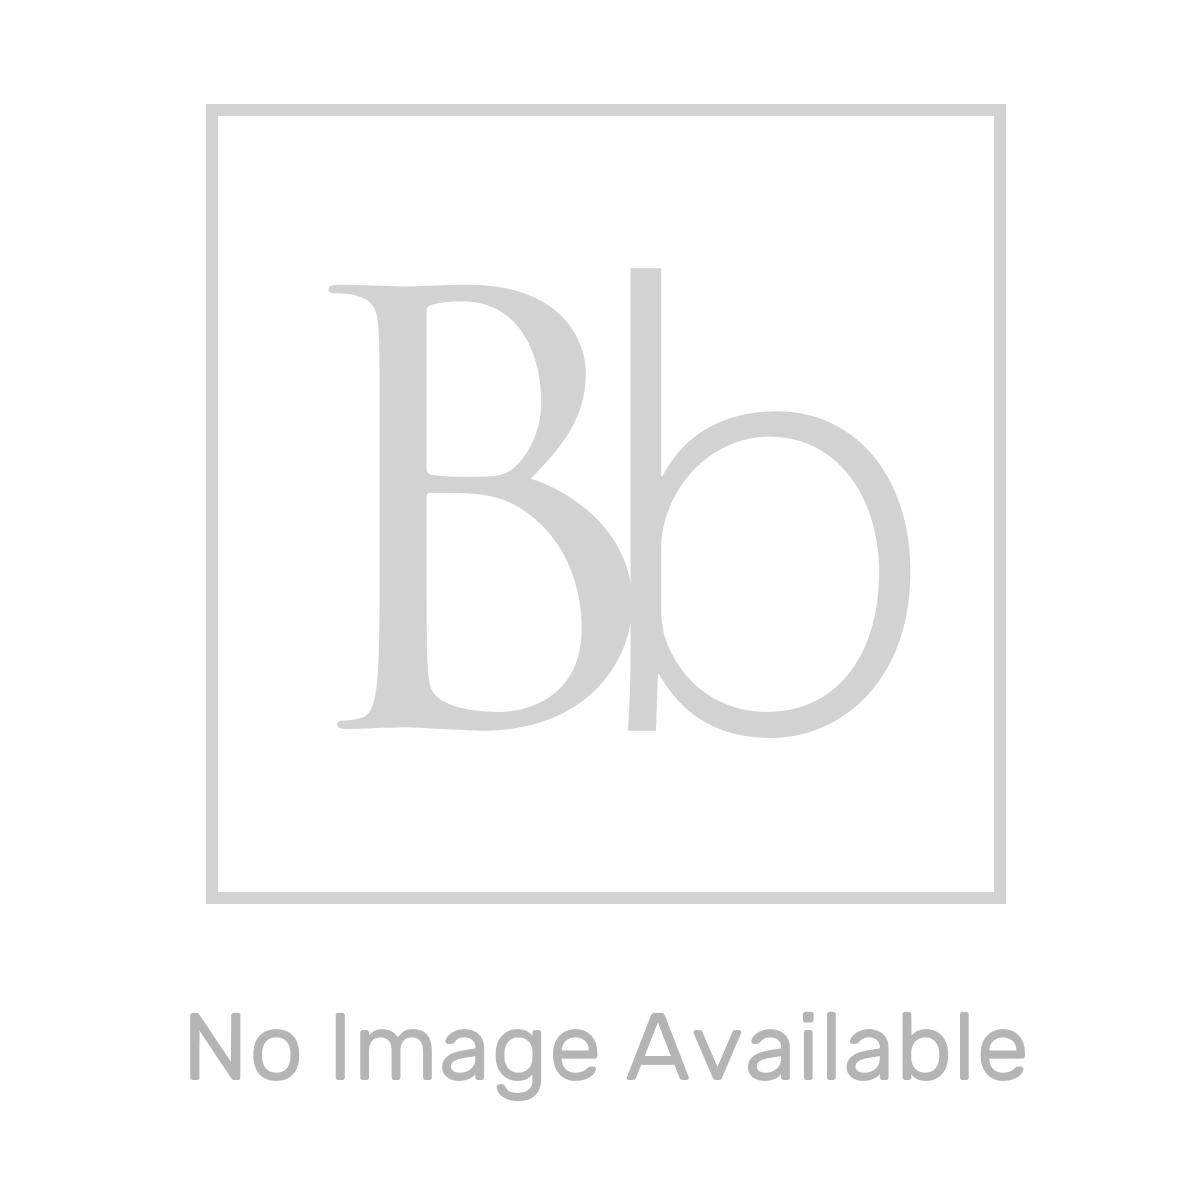 Premier Linton Single Ended Bath 1800 x 800mm Dimensions